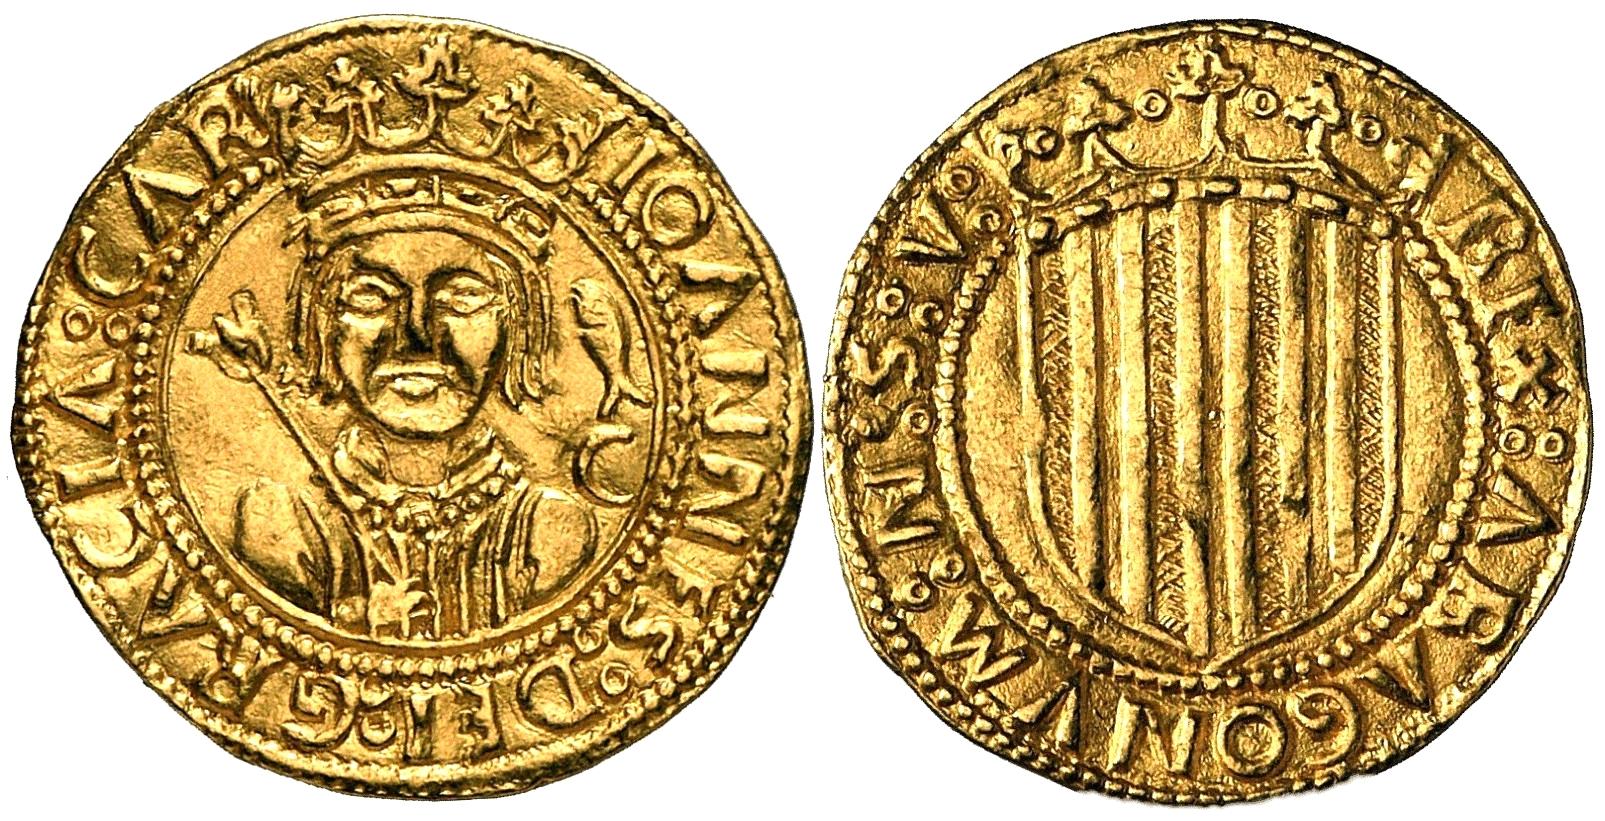 John II of Aragon and Navarre